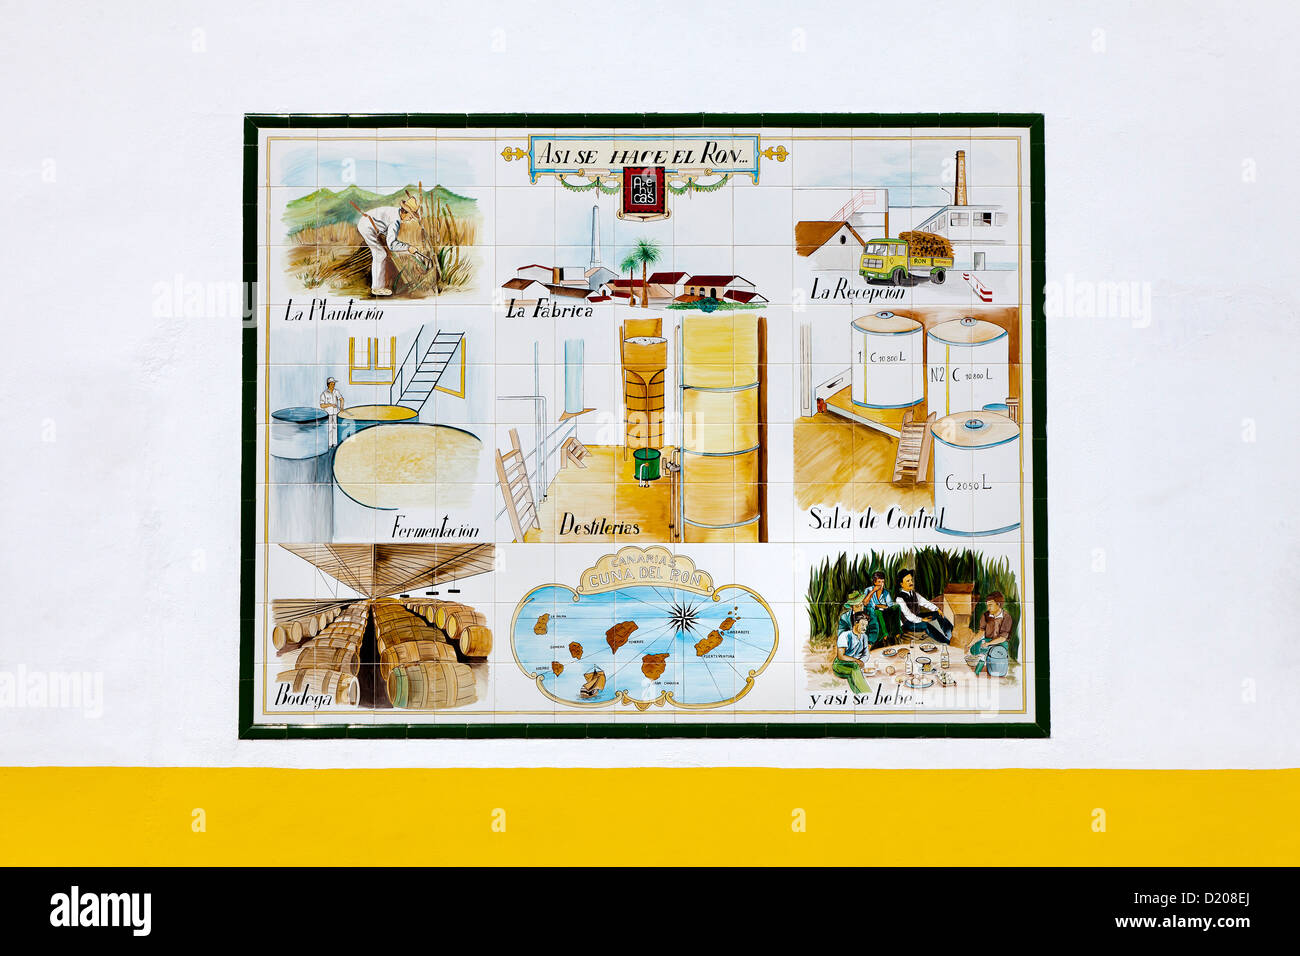 Rum production tile picture, Arehucas Rum Factory, Arucas, Gran Canaria, Canary Islands, Spain - Stock Image